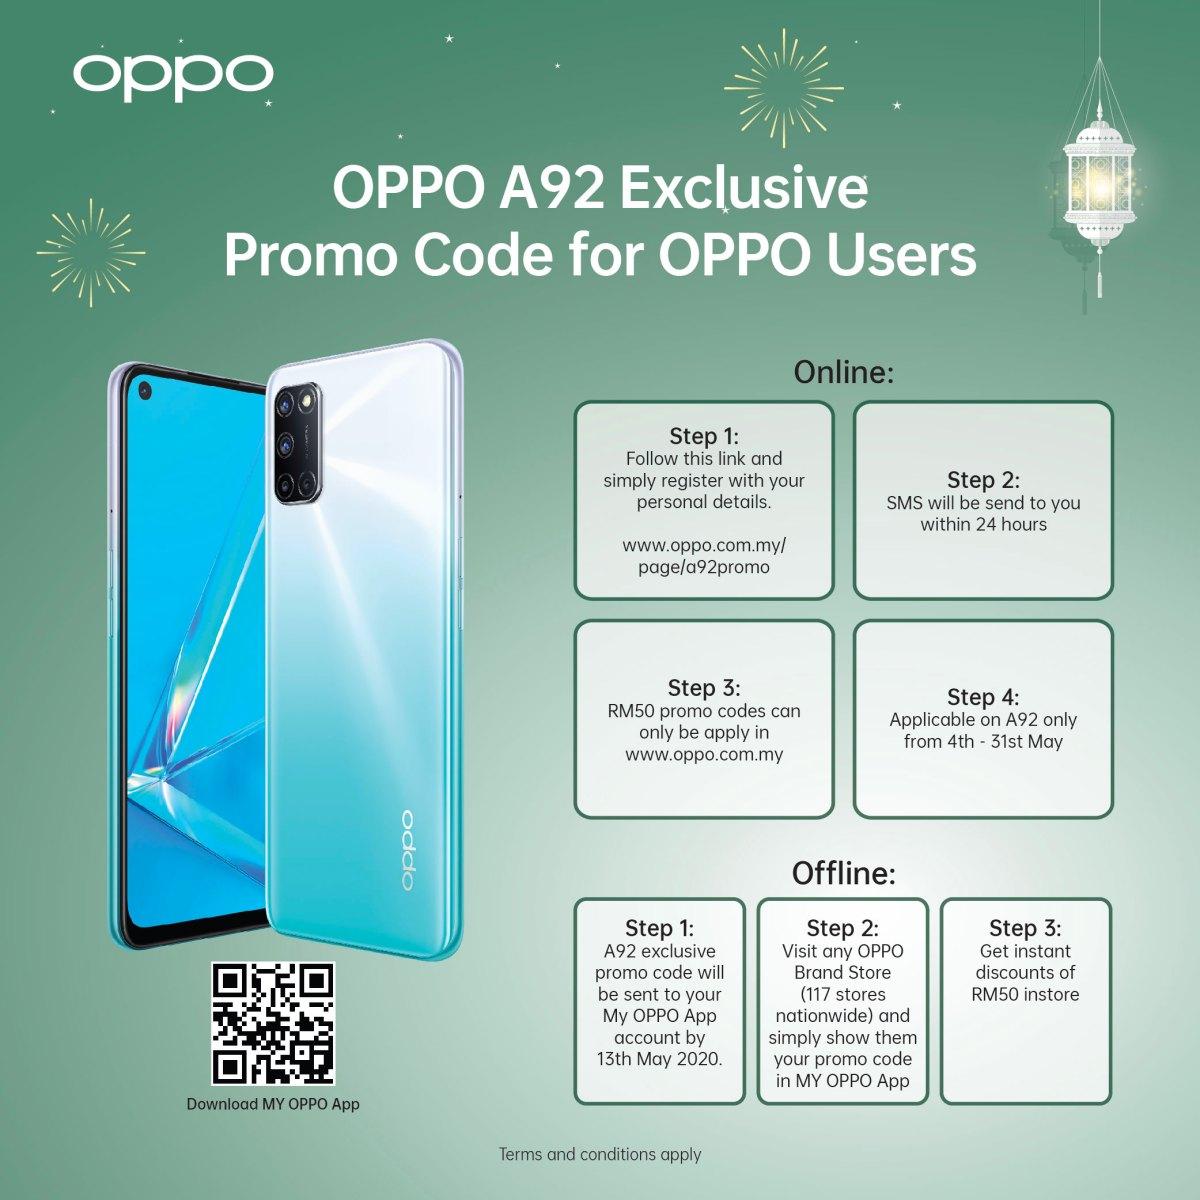 OPPO Raya期间送好康!Find X2、Reno系列等手机可享最高RM499赠品、参加抽奖还可享现金回扣! OPPO-Raya-A92-Rebate